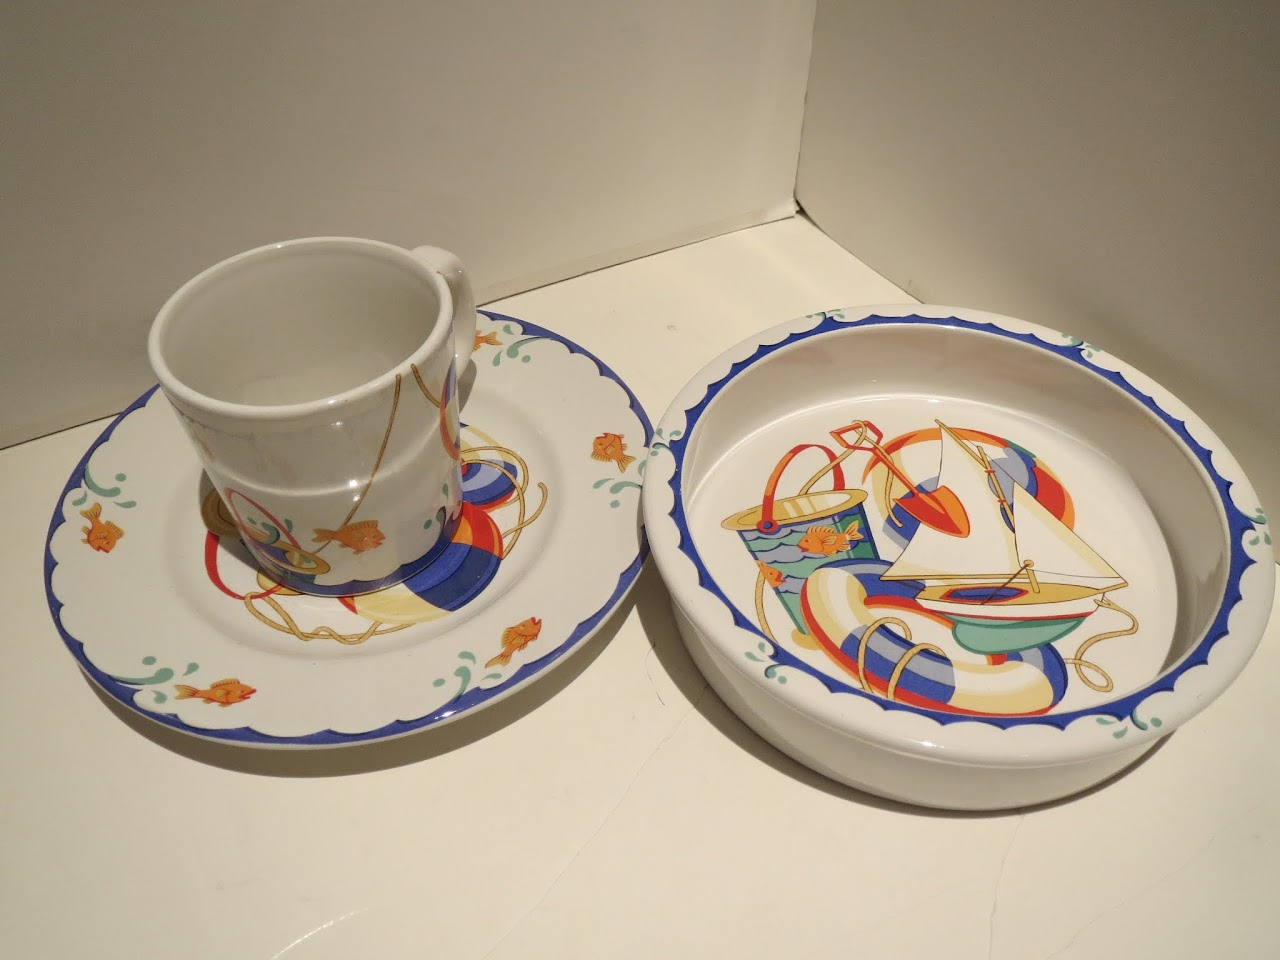 Tiffany & Co. 'Tiffany Seashore' Mug, Plate, and Bowl